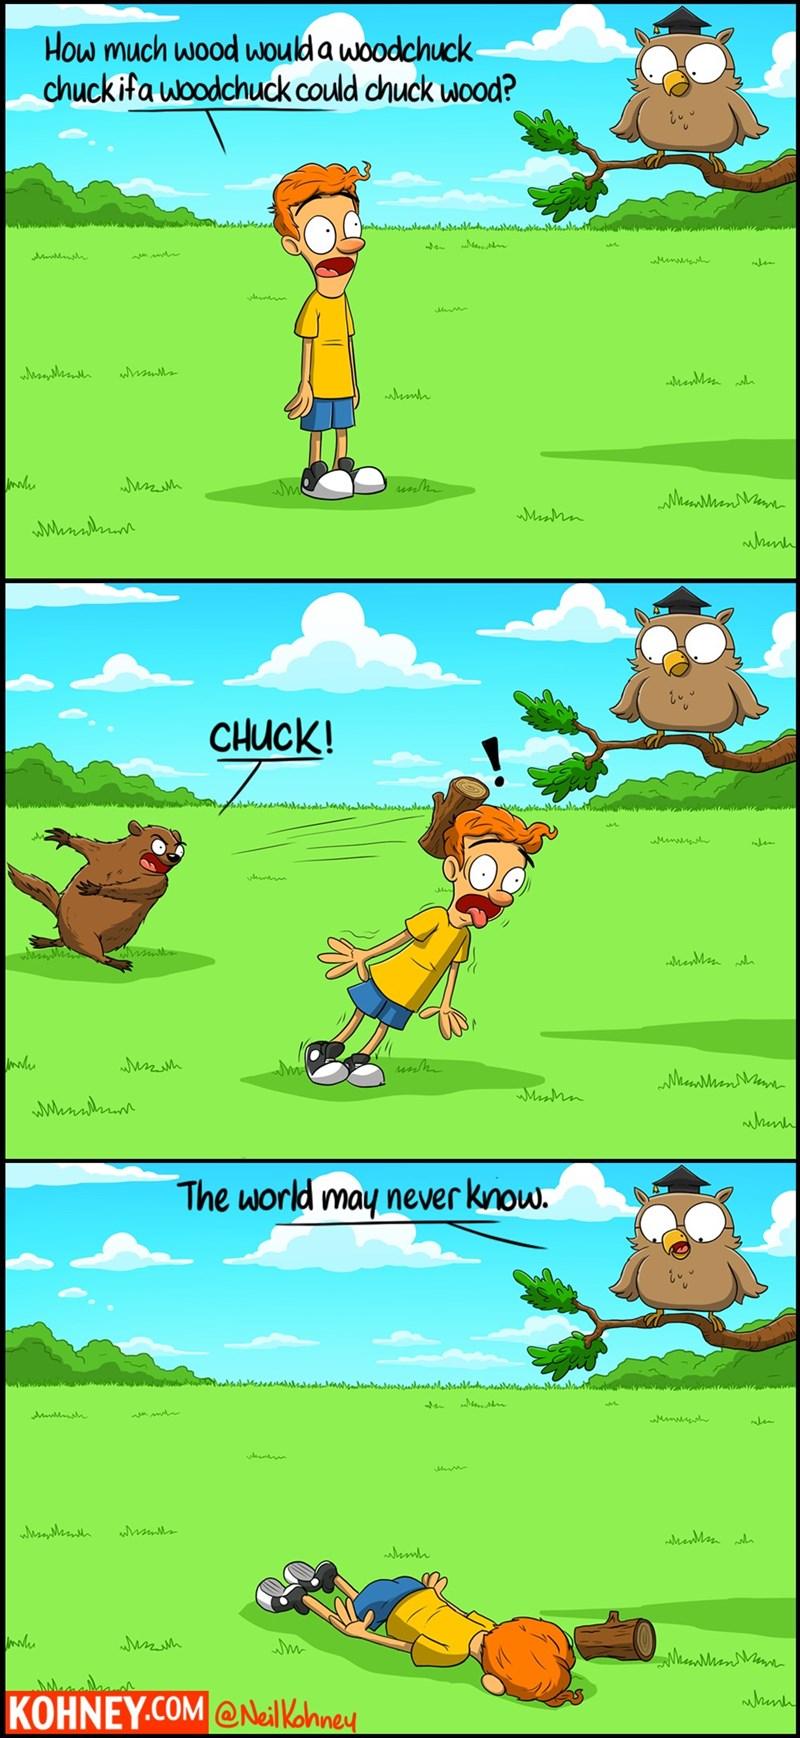 critters owls web comics woodchuck - 8560849408